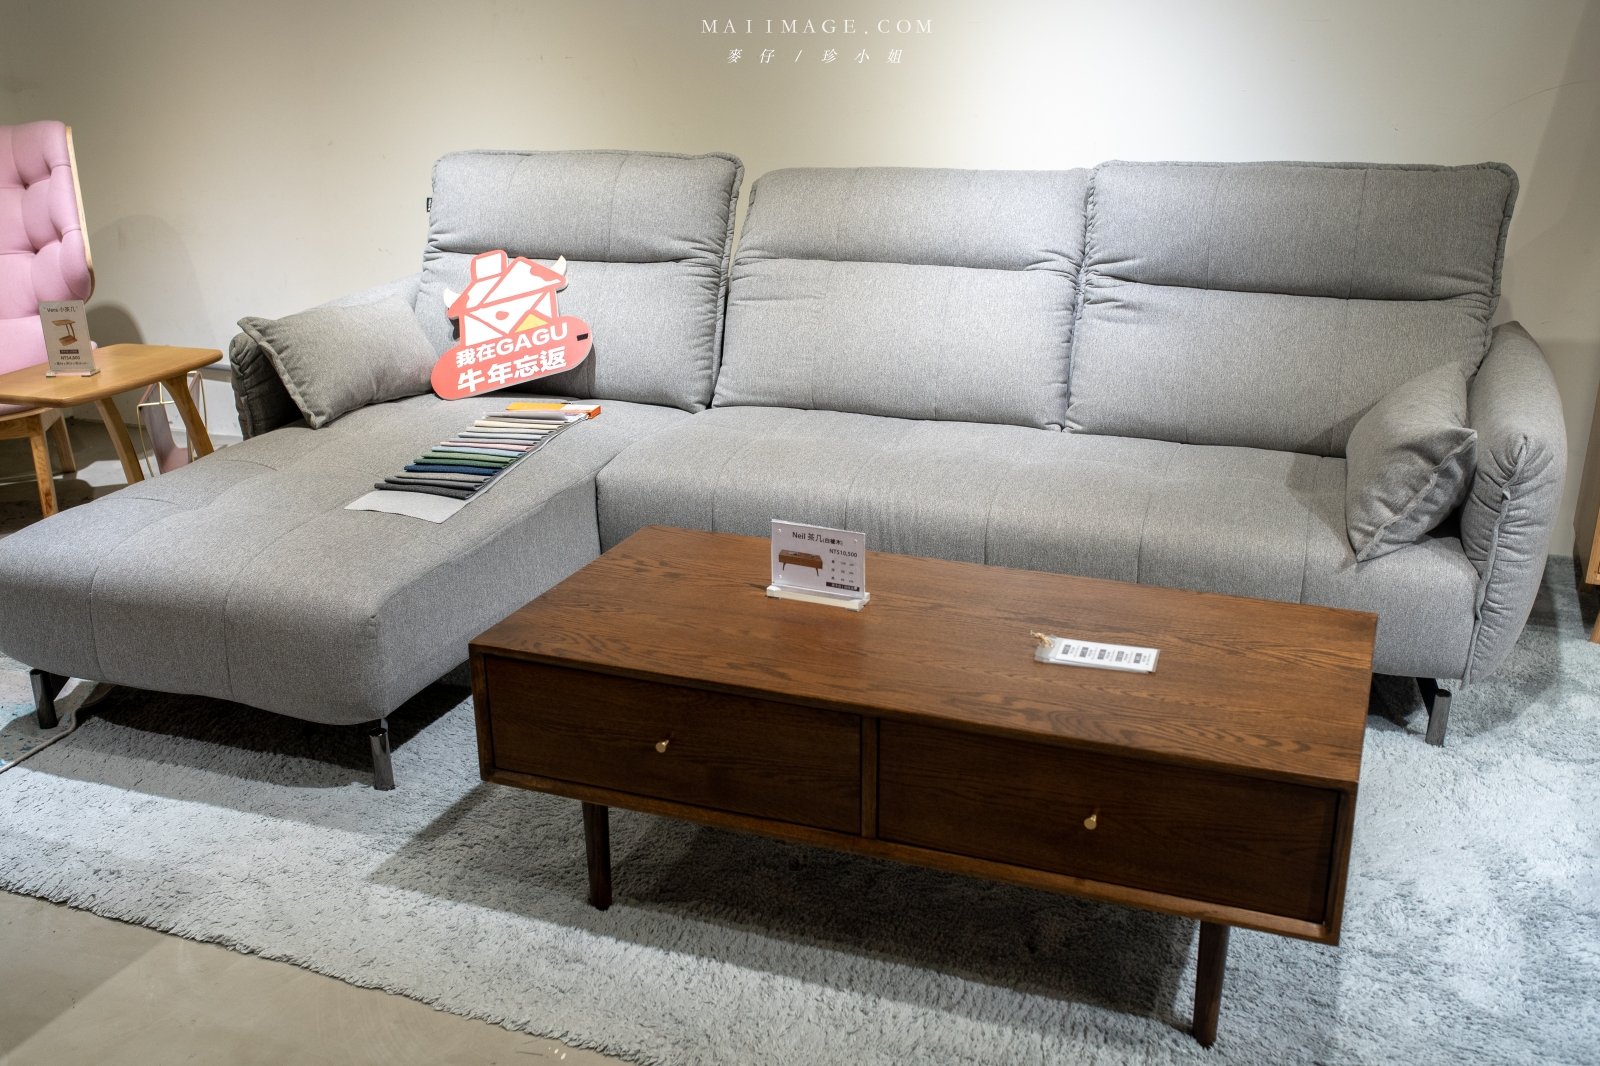 GAGU北歐家具工廠五股店|最貼心的客製化沙發在這裡,現在最夯的GAGU SLEEP你聽過嗎?100晚試躺活動開跑,送到你家免運費、五股家具工廠推薦